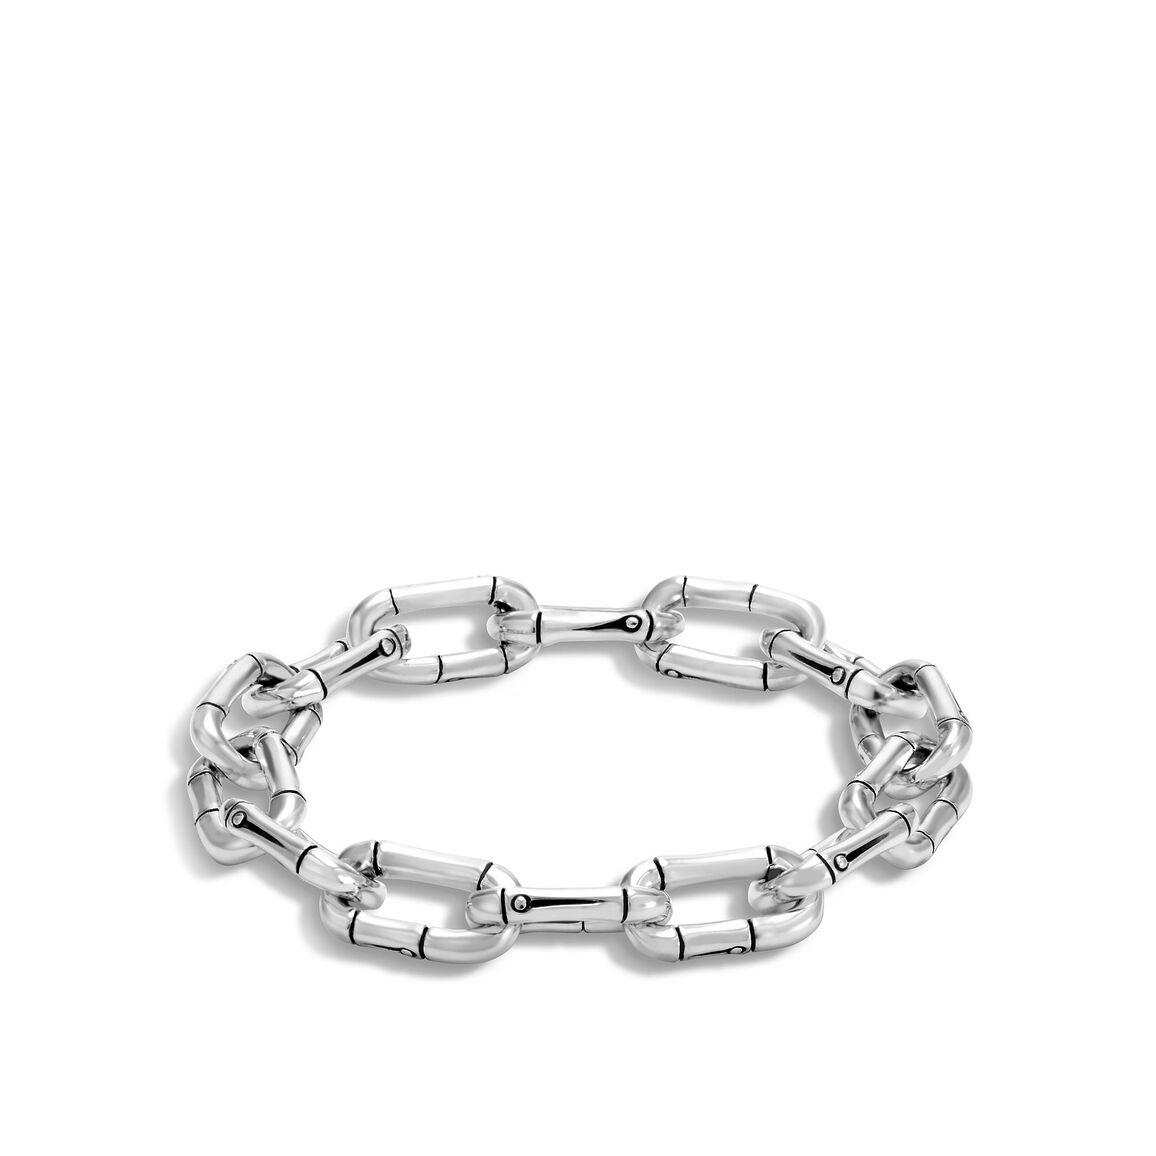 Bamboo 10.5MM Link Bracelet in Silver